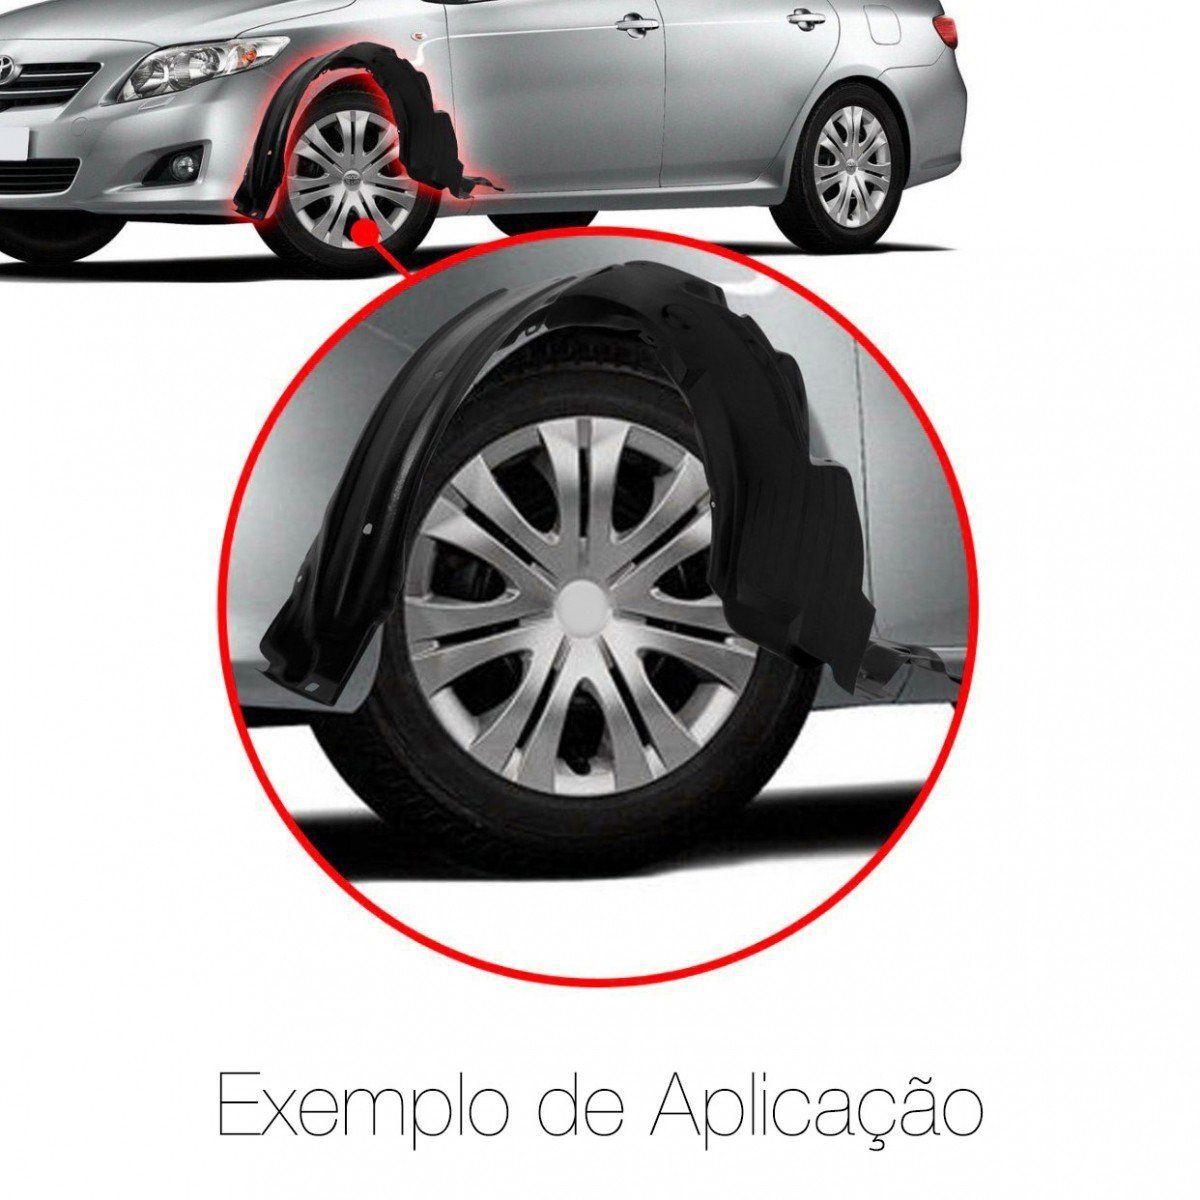 Parabarro Fiesta Hatch / Sedan - 2003 2004 2005 2006 2007